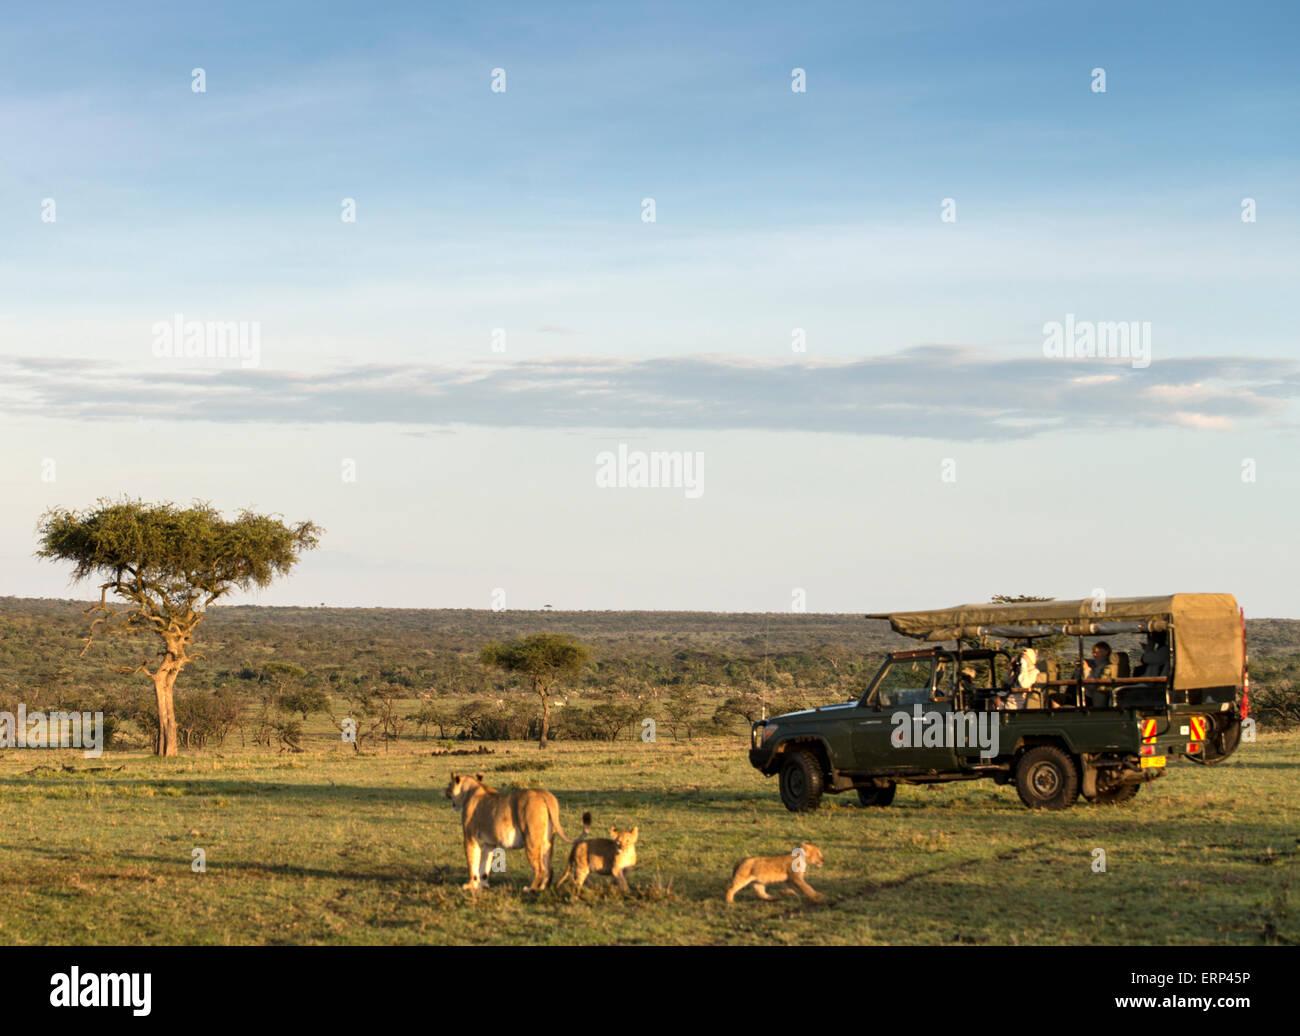 Adult female lion (Panthera leo) with cubs and safari car Mara Naboisho conservancy Kenya Africa - Stock Image